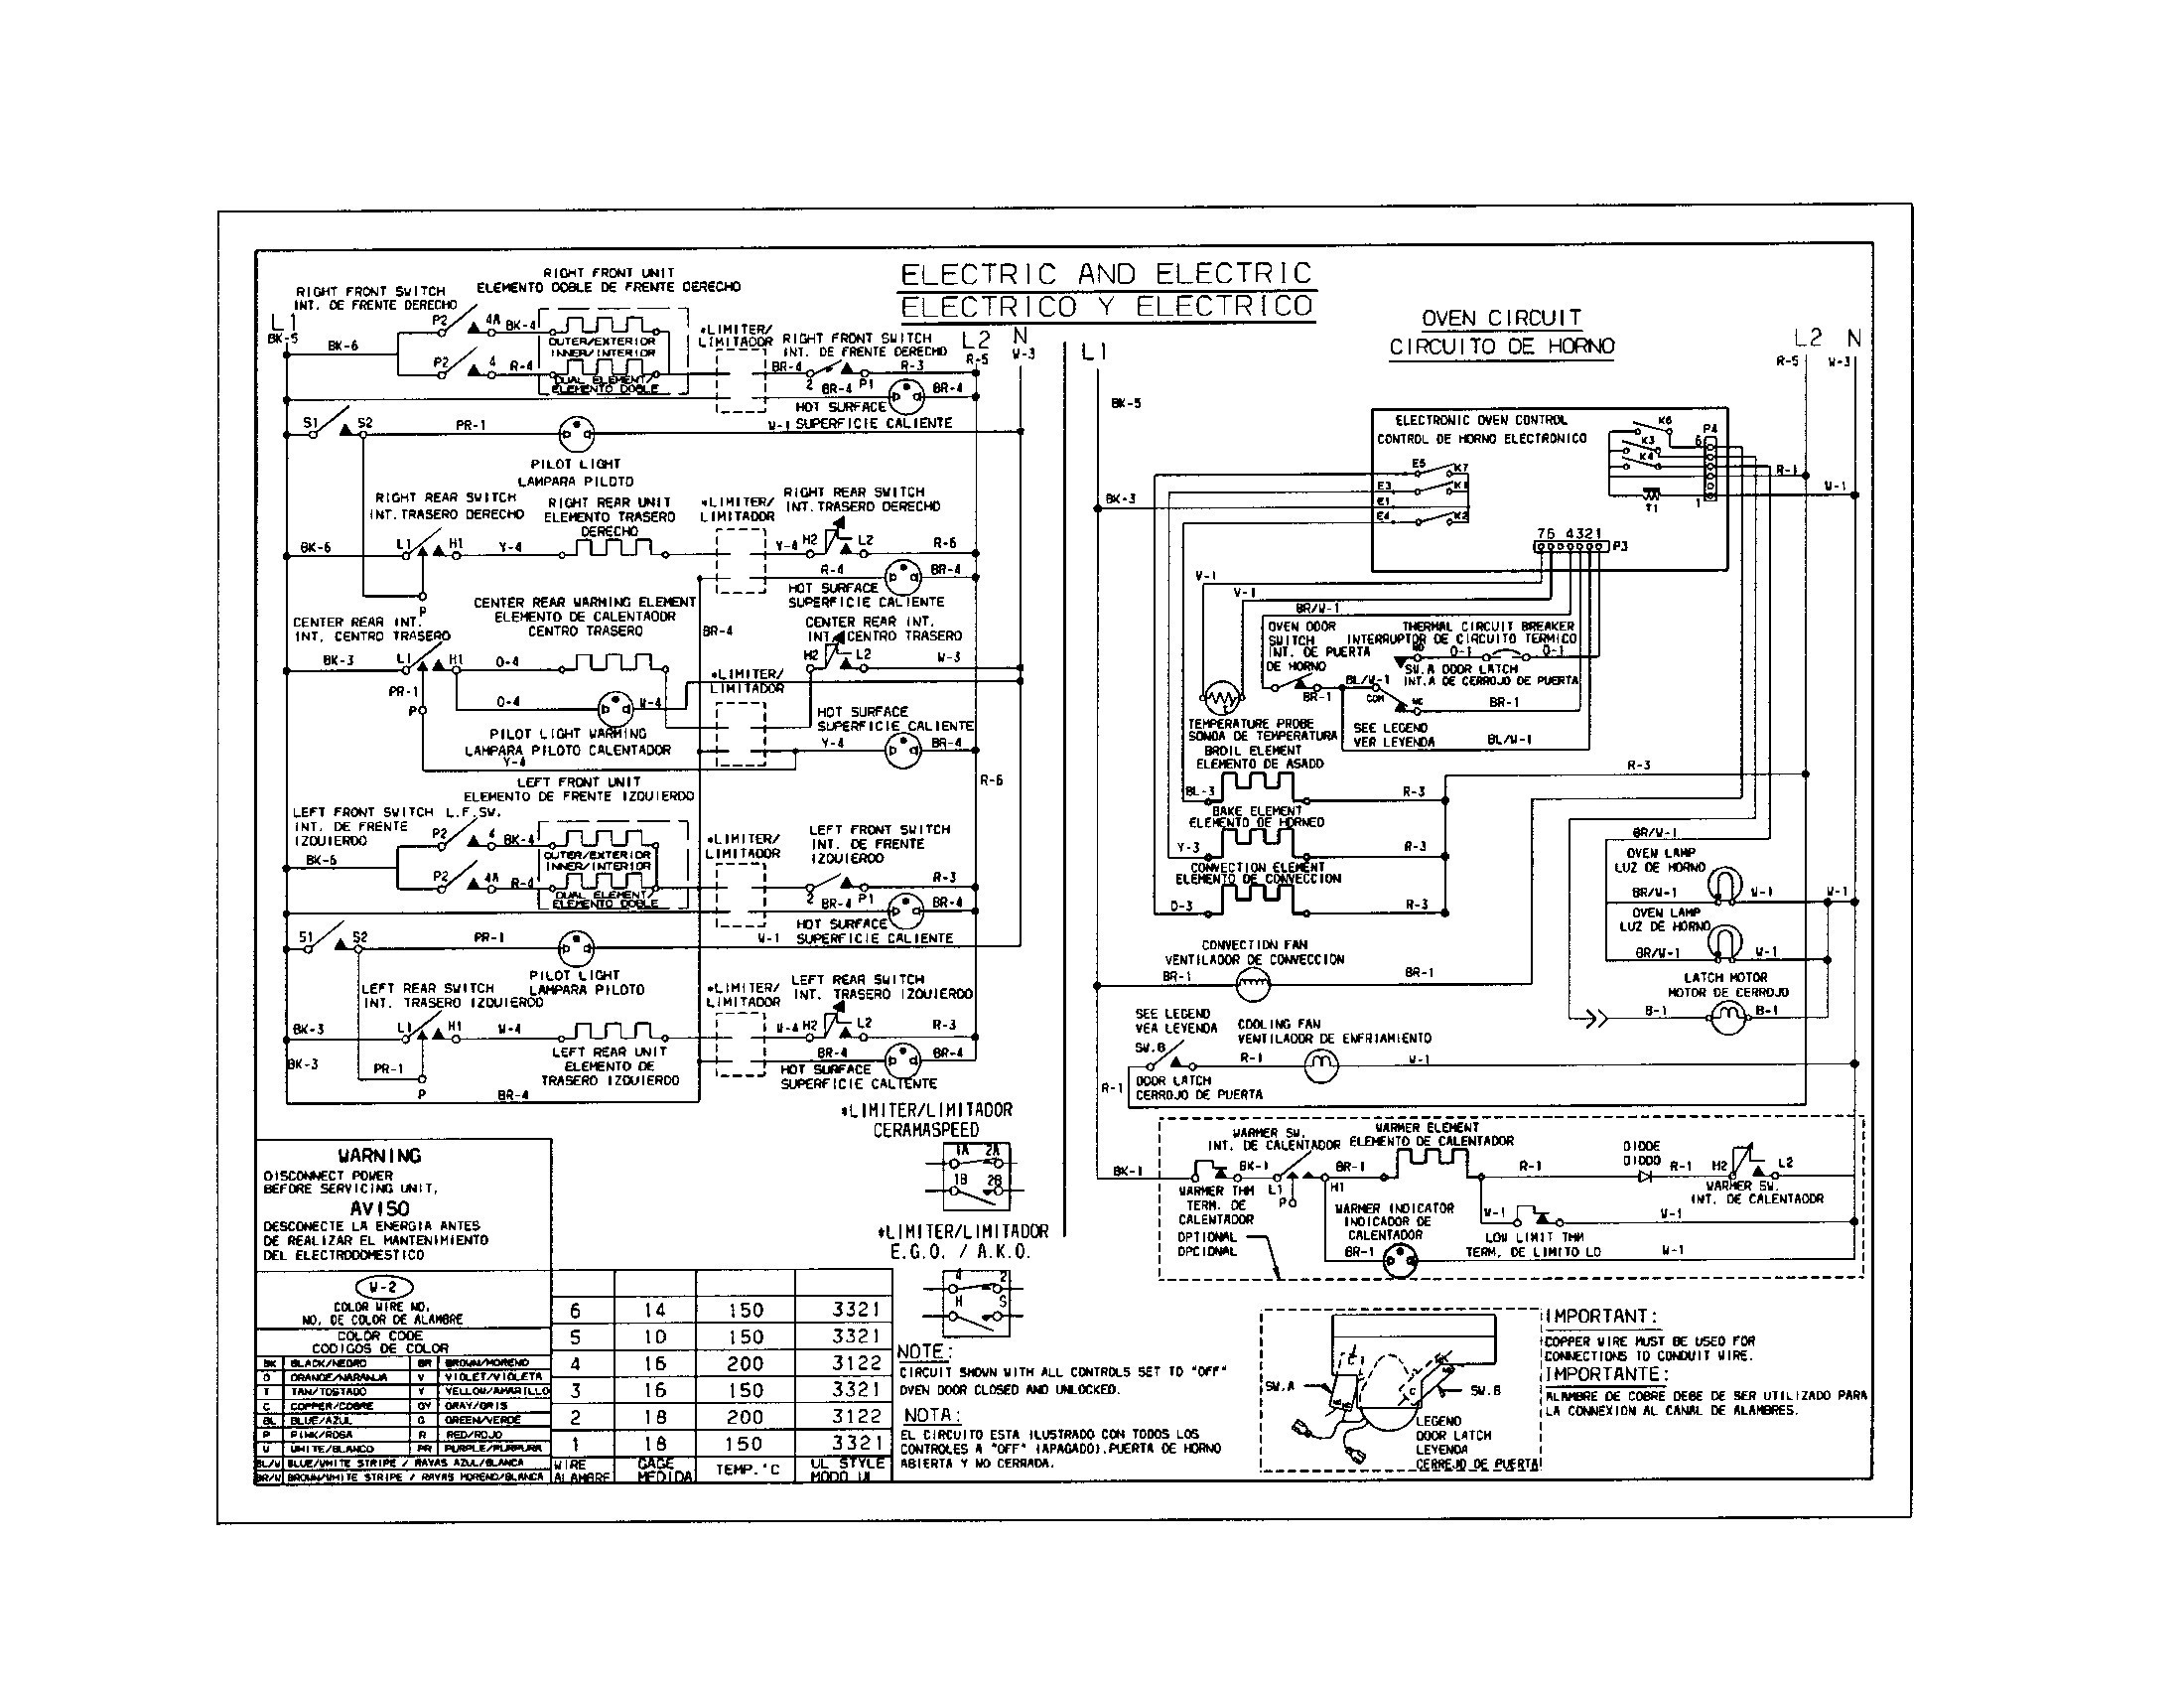 Whirlpool Electric Range Wiring Diagram - Panoramabypatysesma - Whirlpool Dryer Wiring Diagram